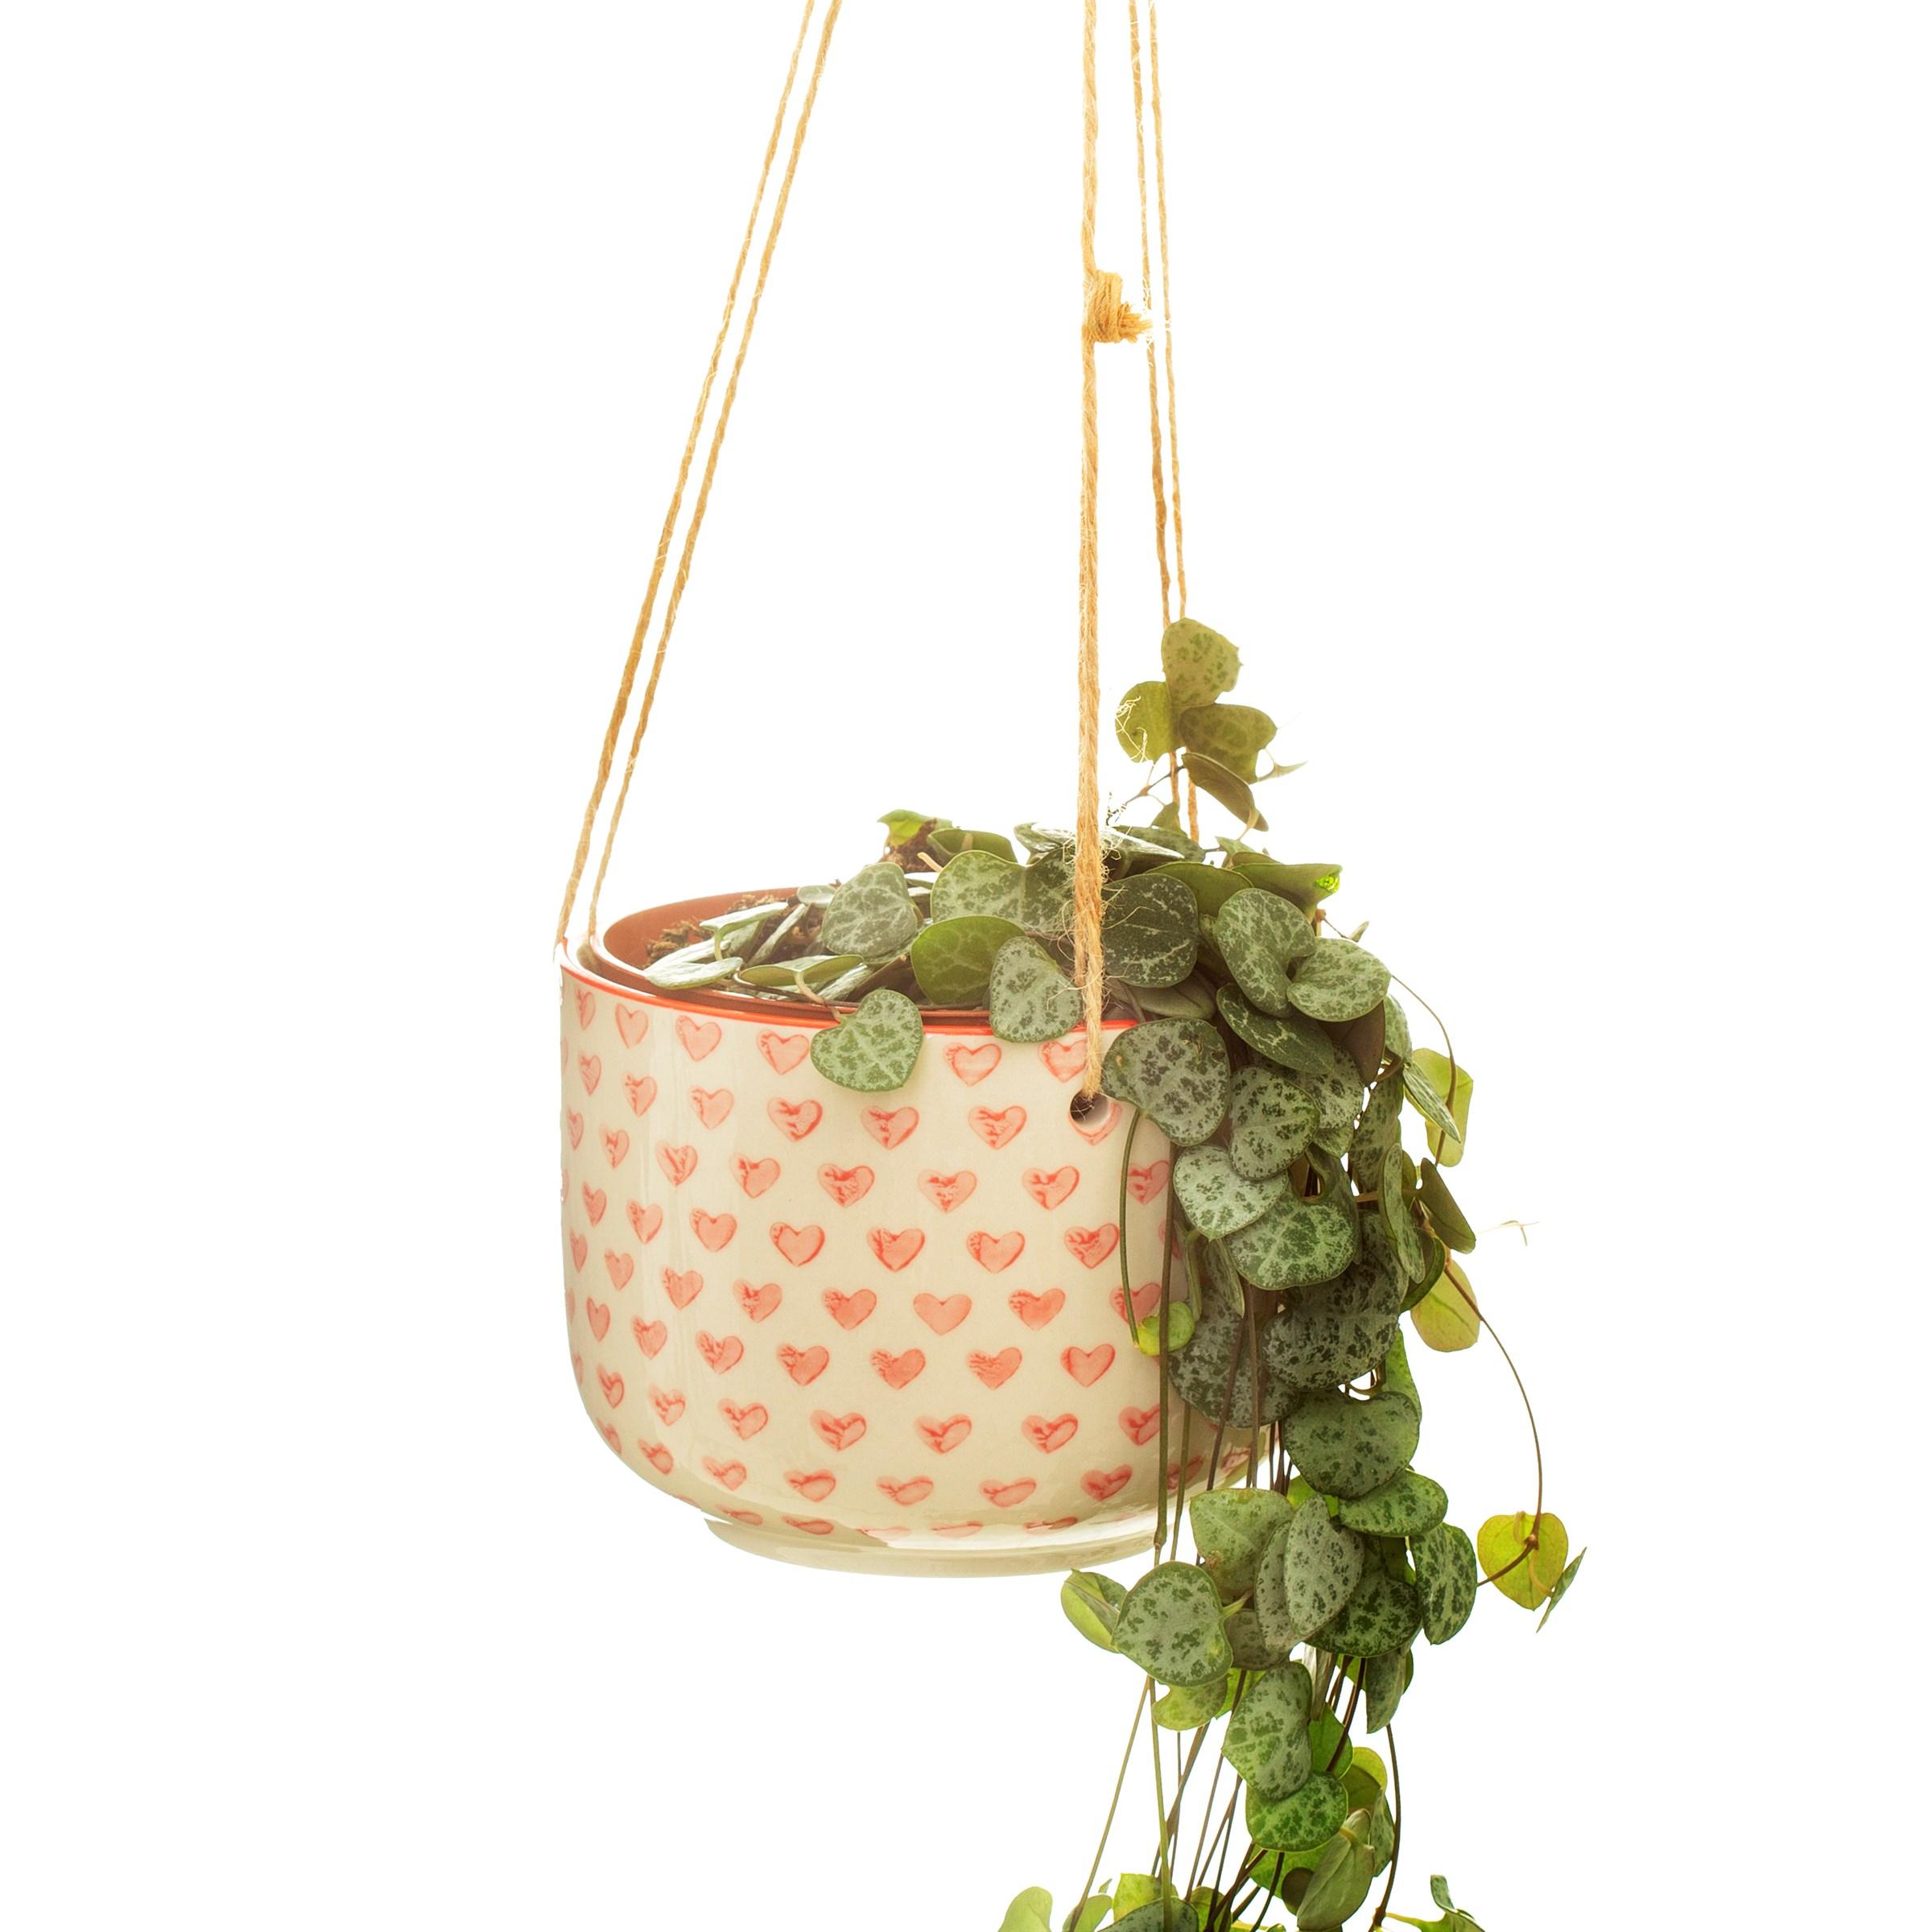 Sass & Belle Red Love Heart hanging planter hangpot